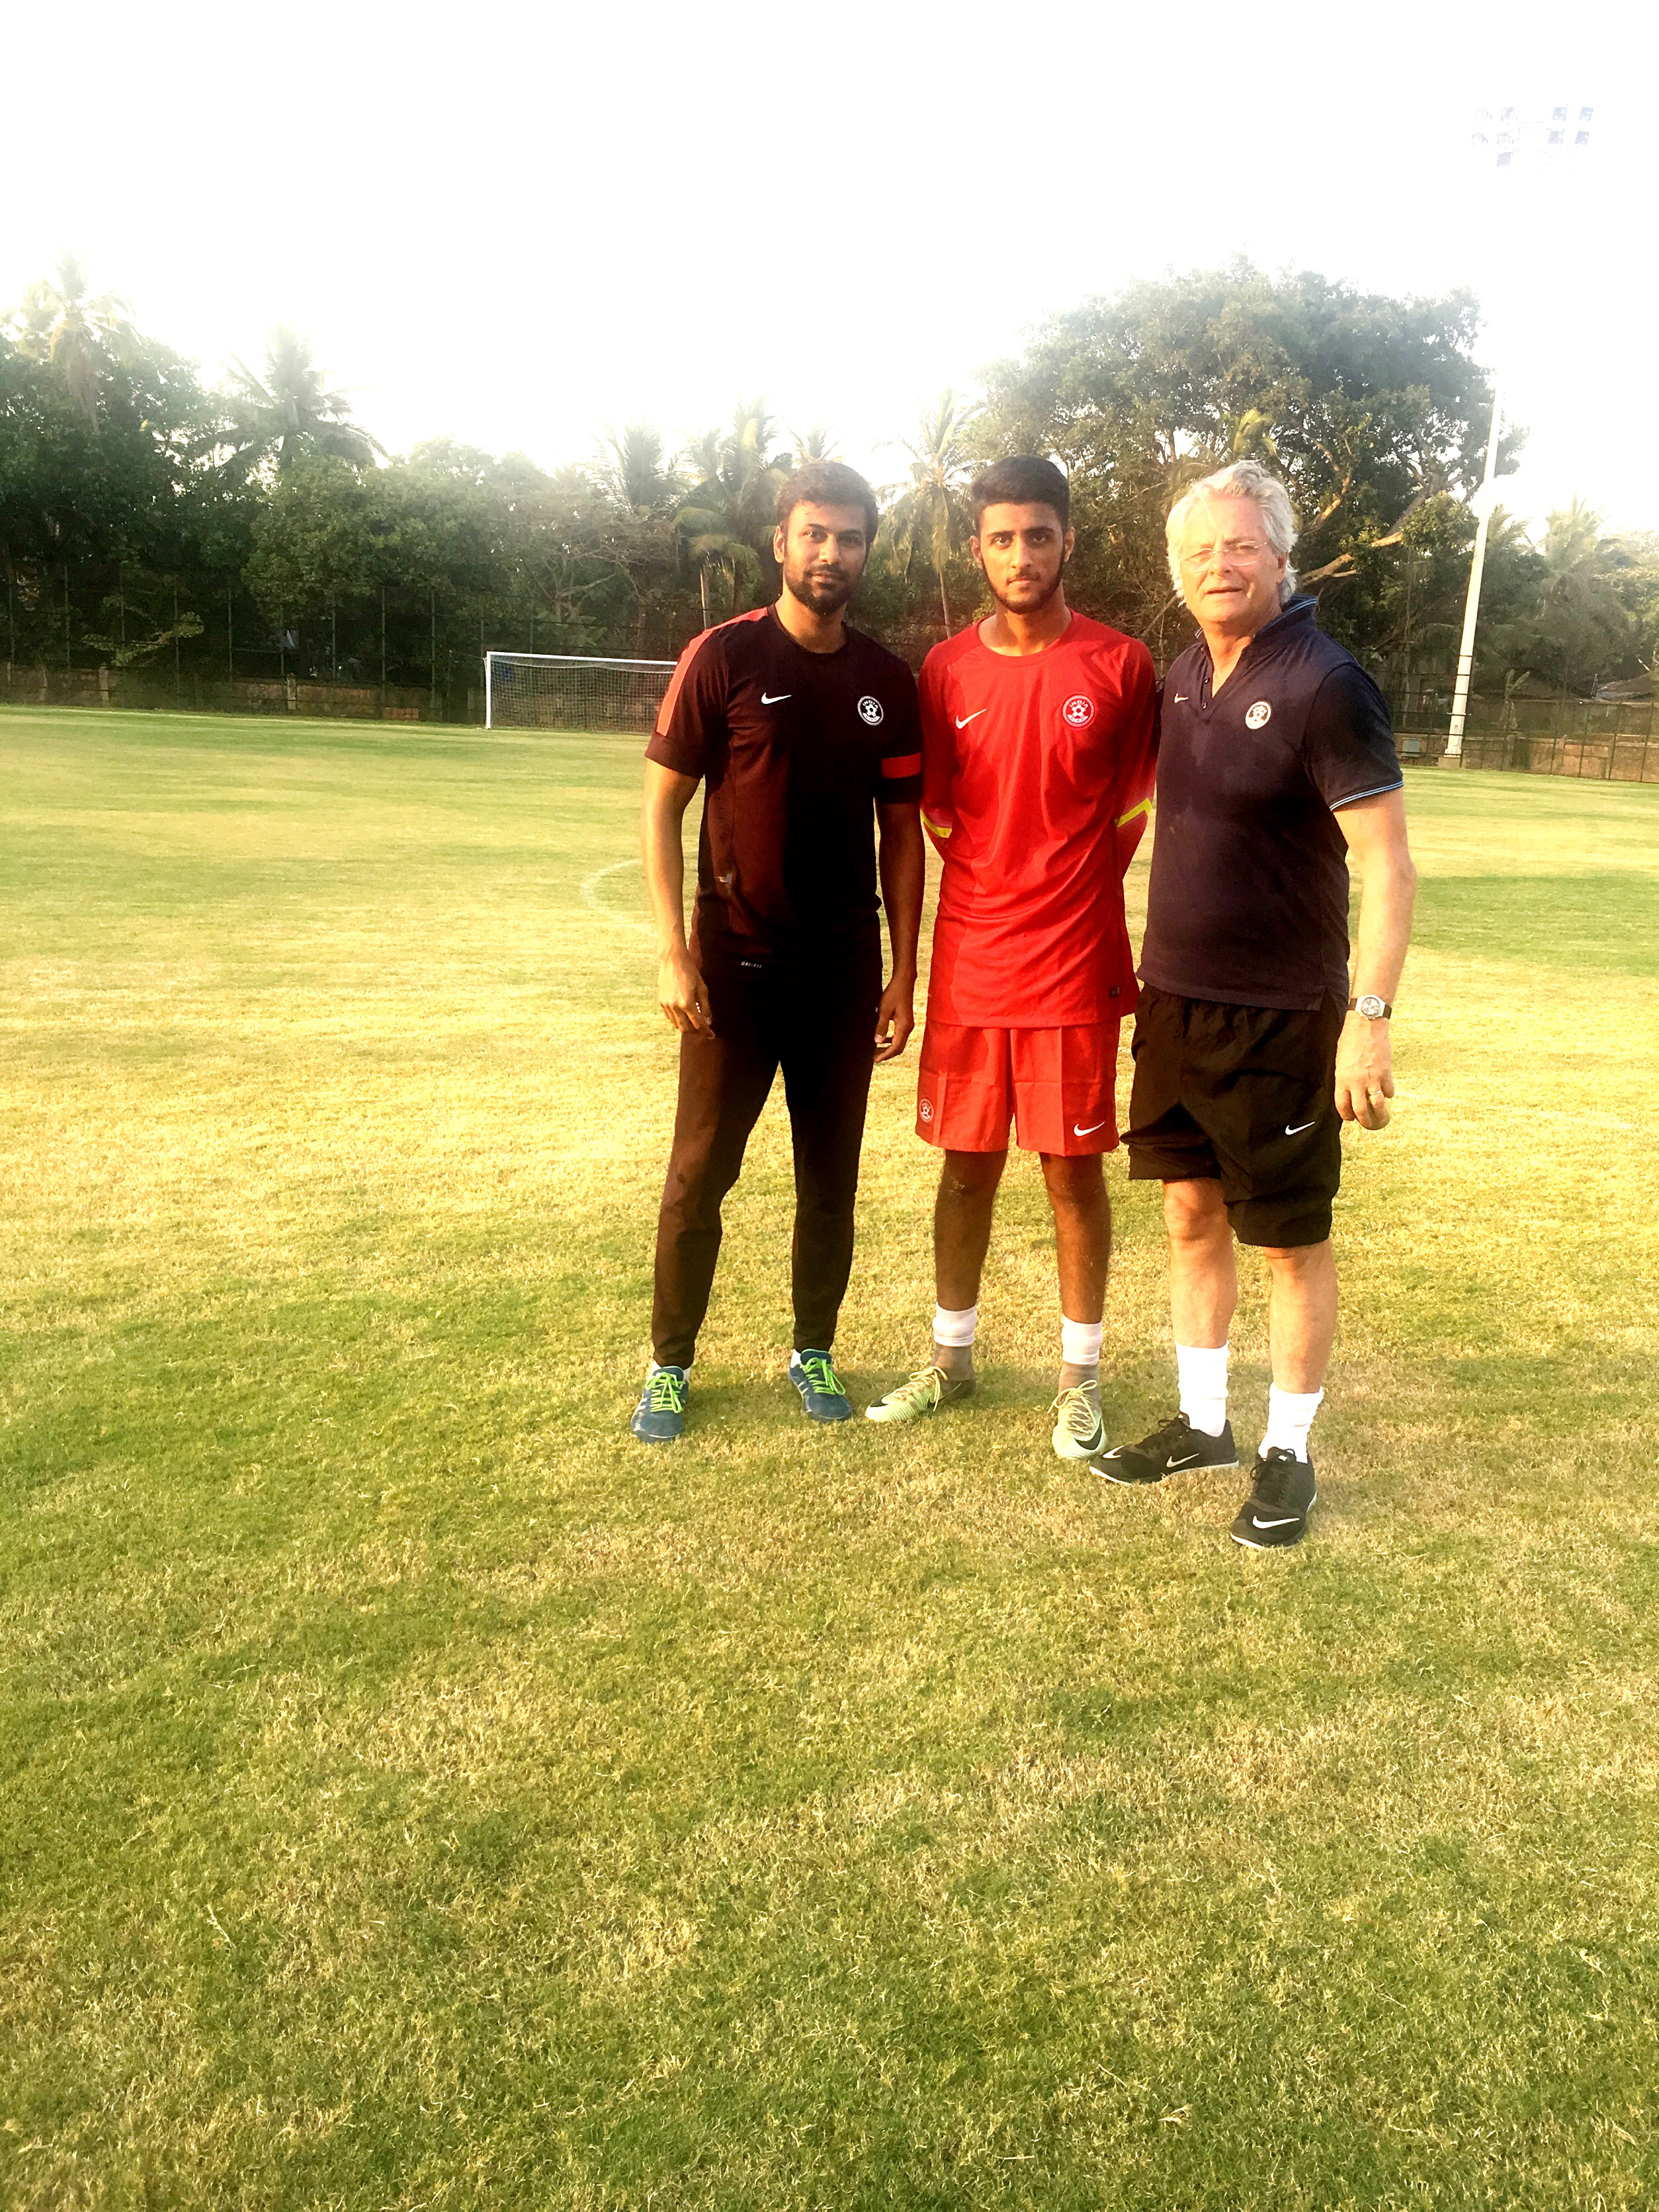 Sunny Dhaliwal India U-17 Abhishek Yadav Luis Norton de Matos